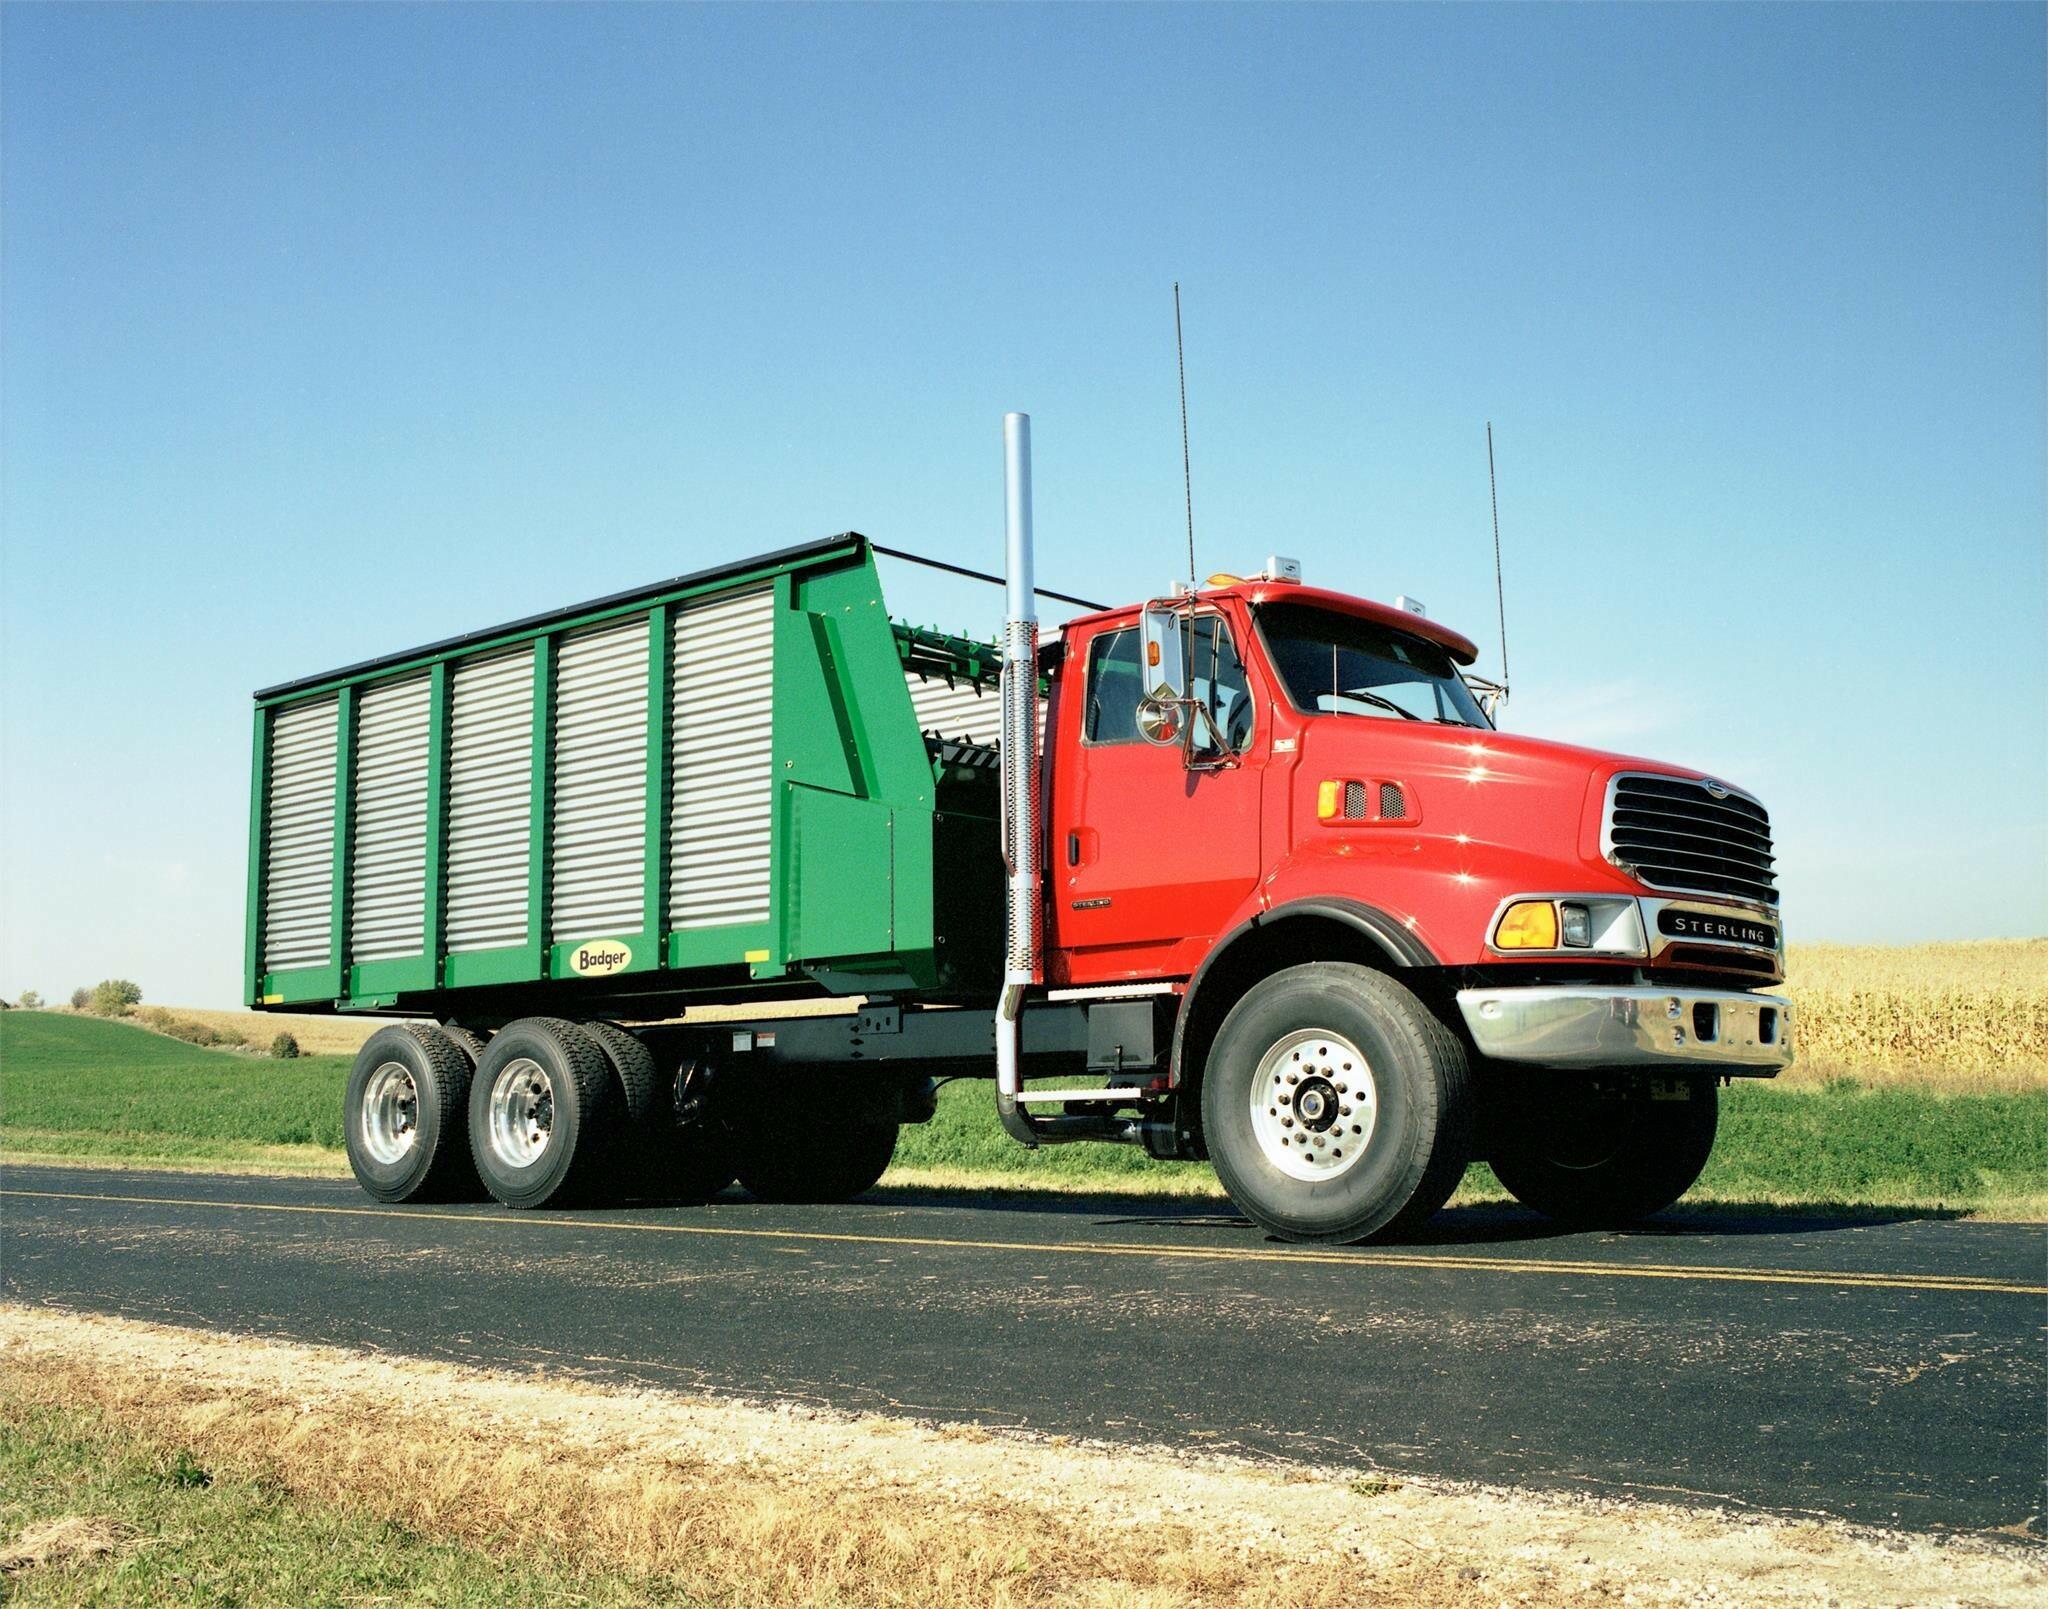 2021 Badger 1200 Forage Wagon